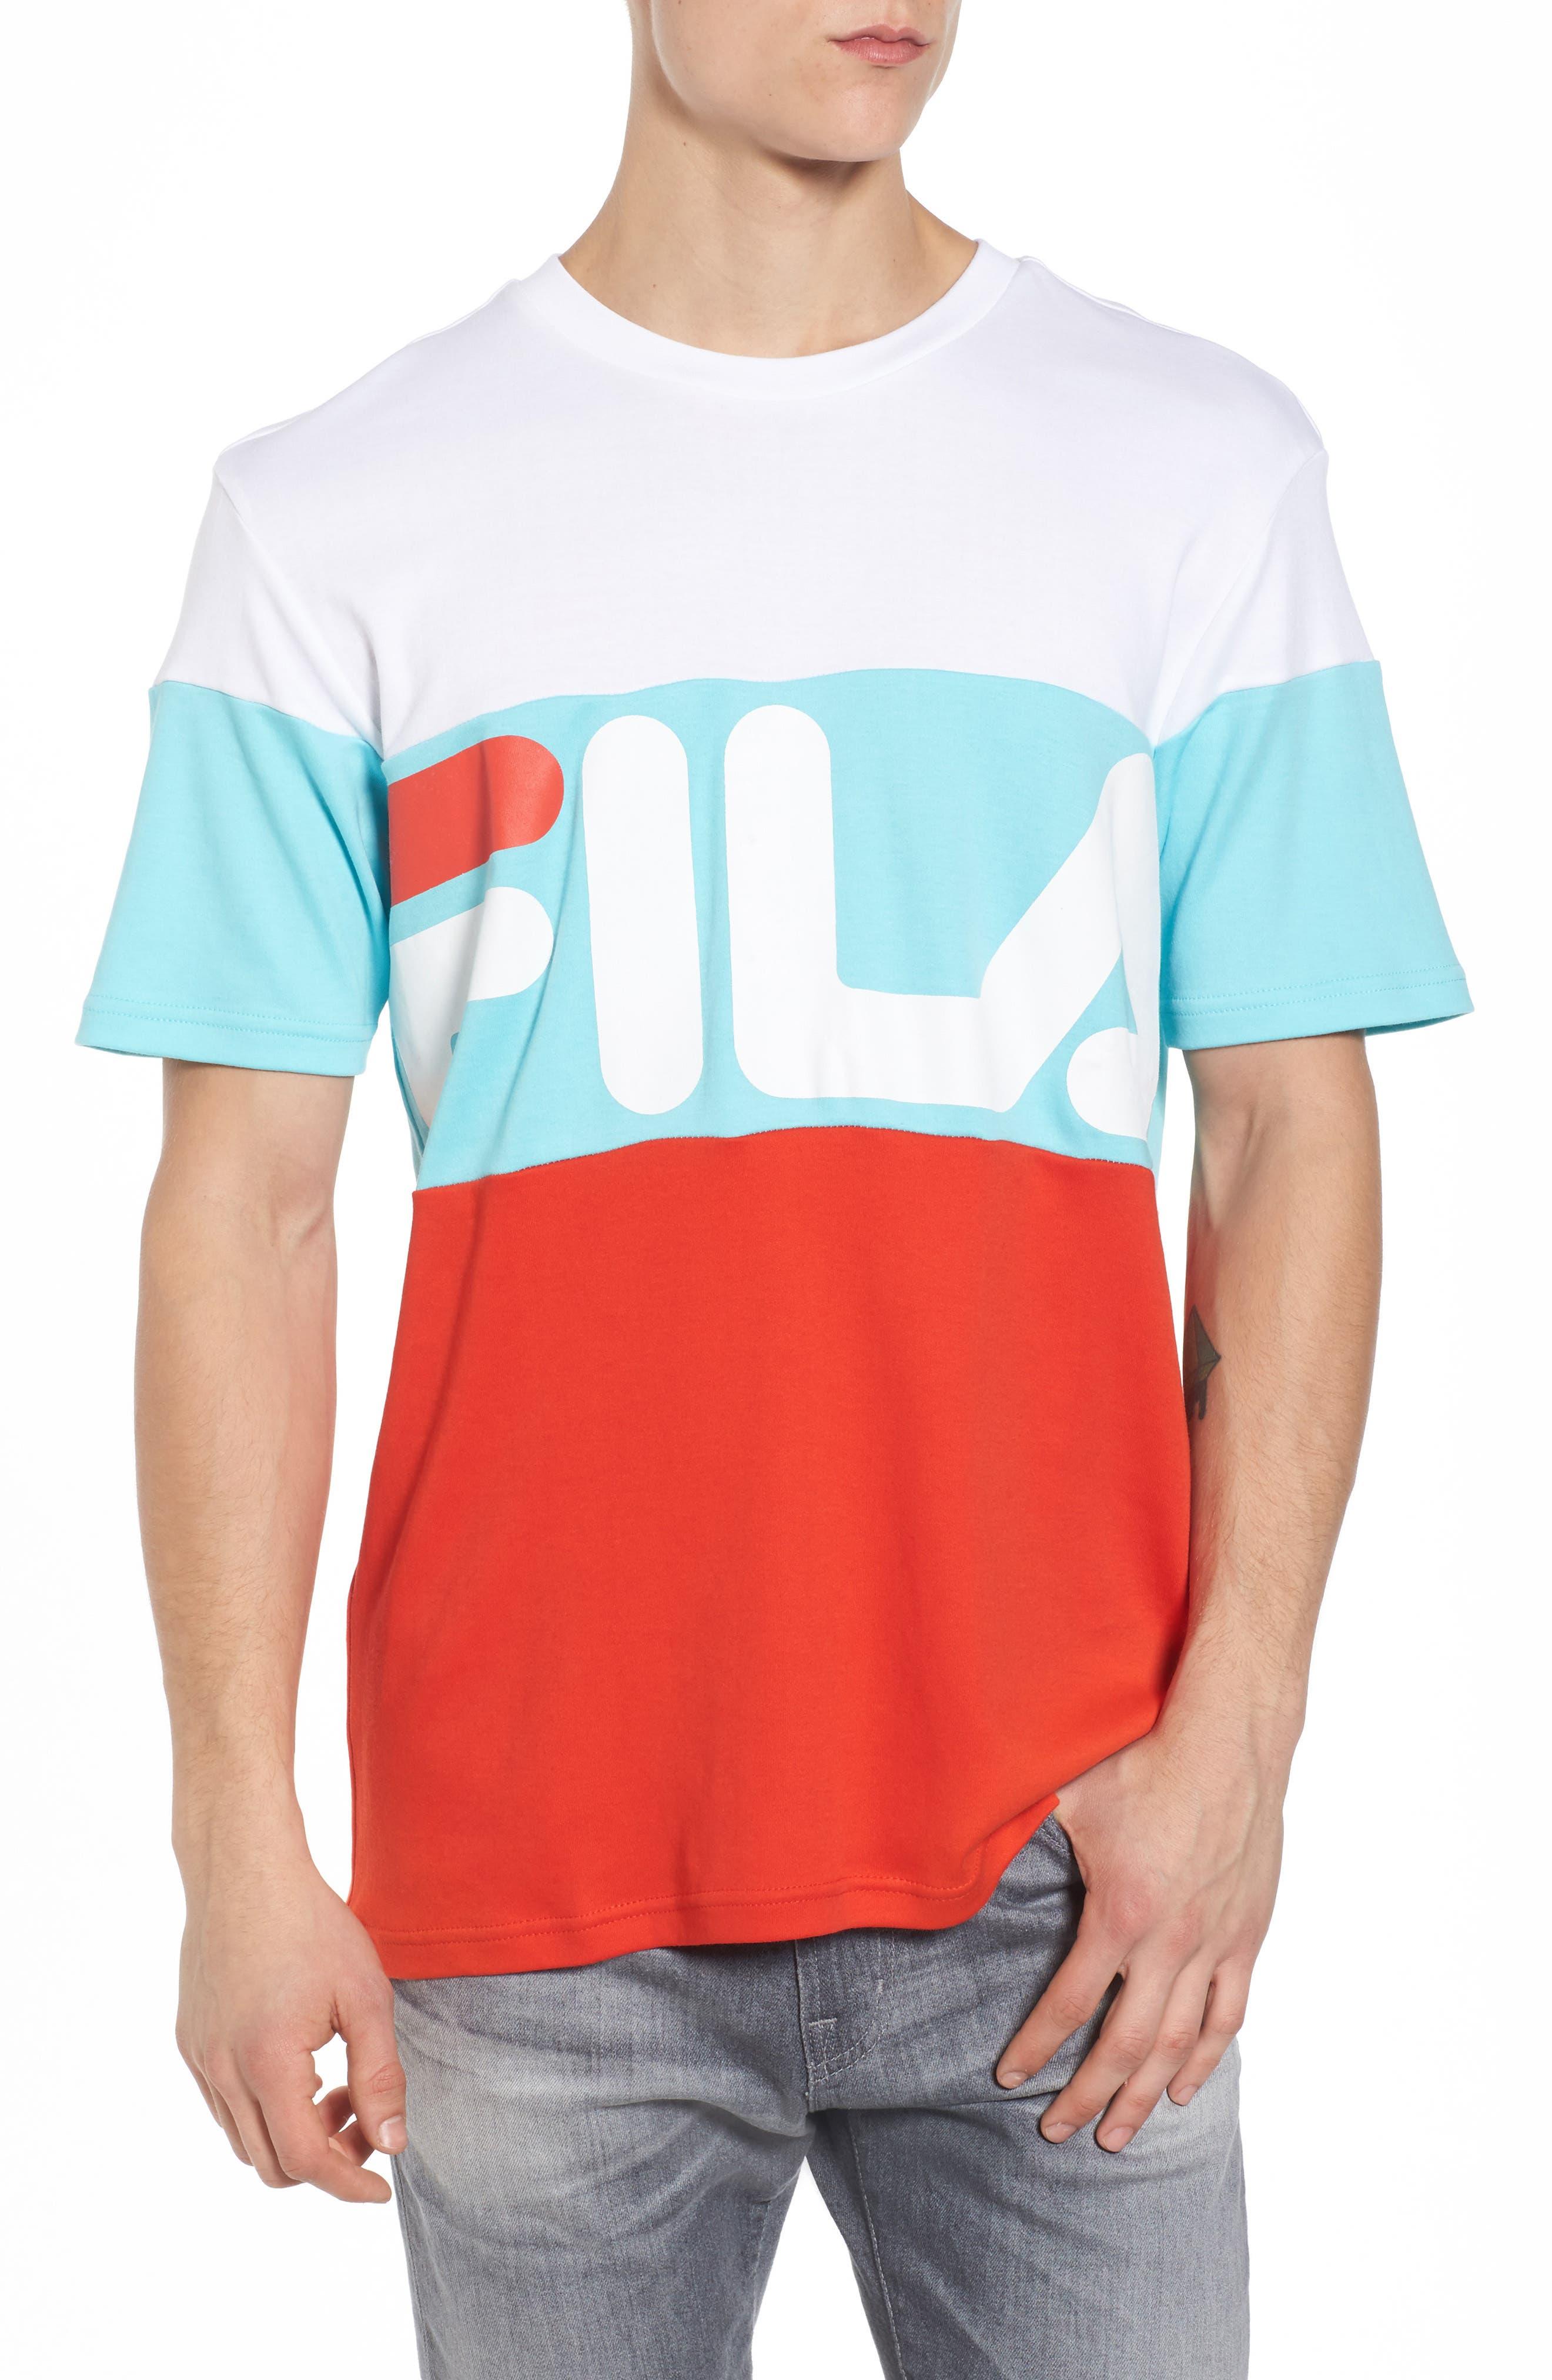 Alternate Image 1 Selected - FILA Vialli Colorblock Logo T-Shirt